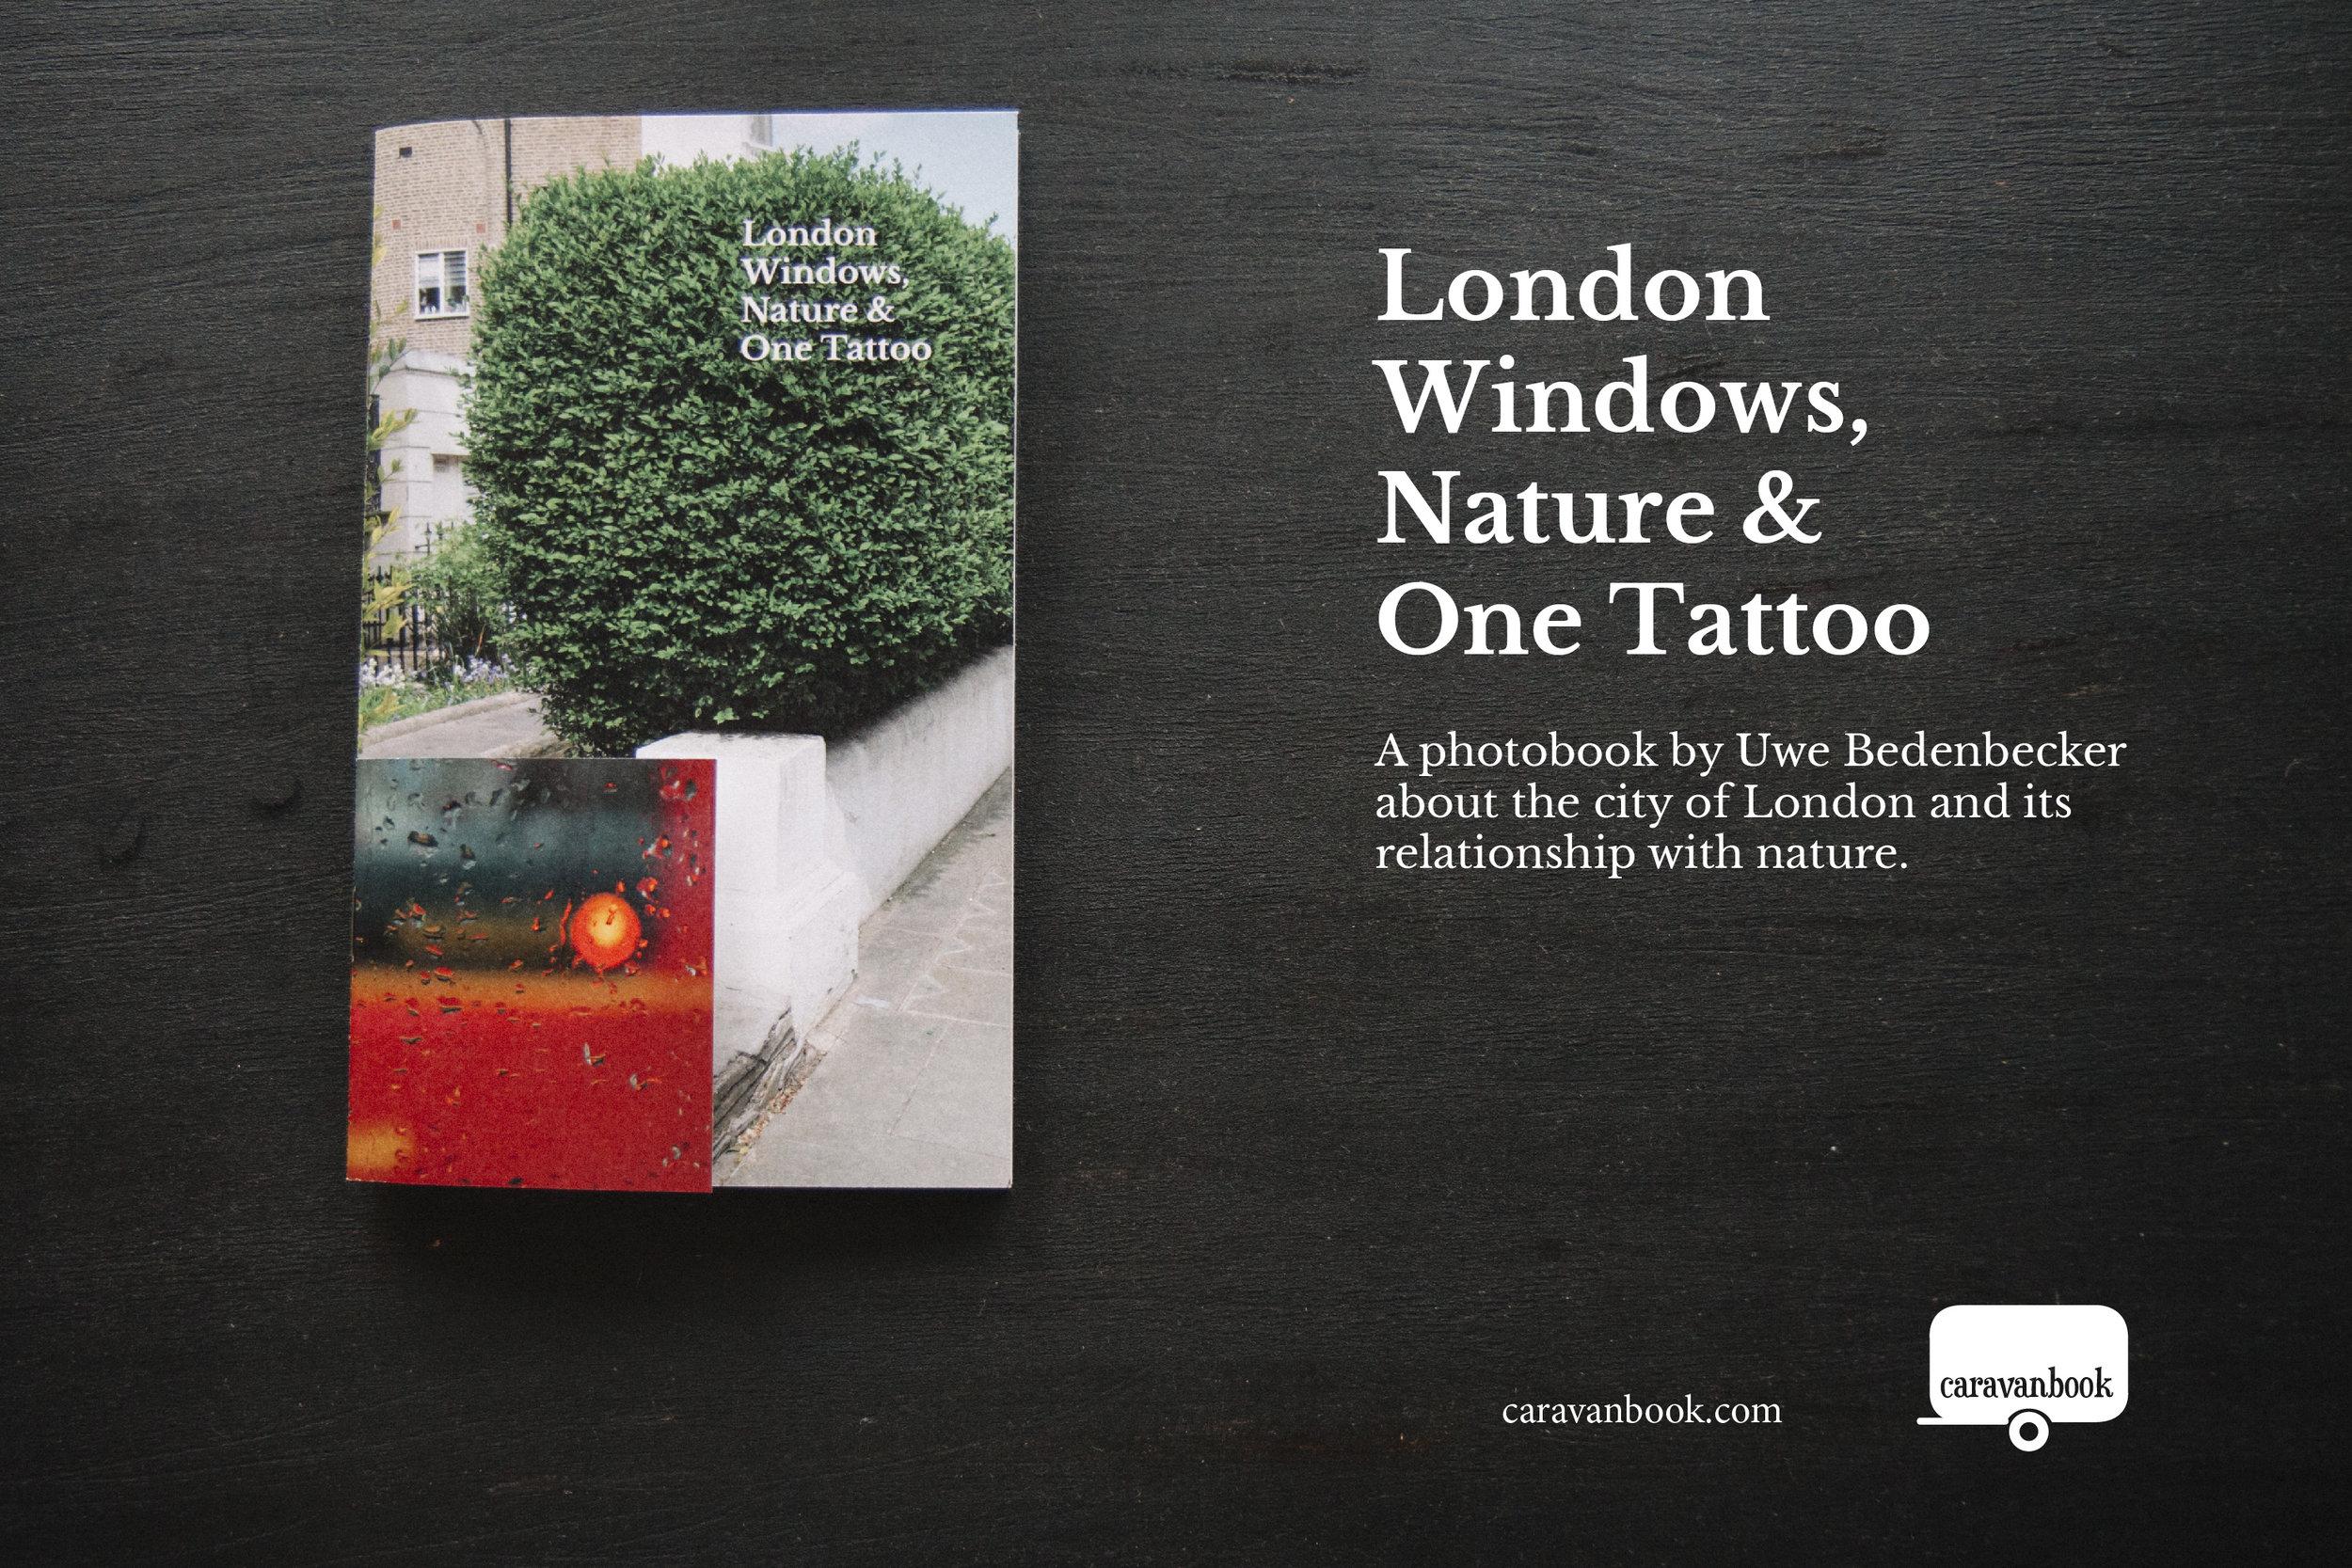 caravanbook_London_photobook_english.jpg